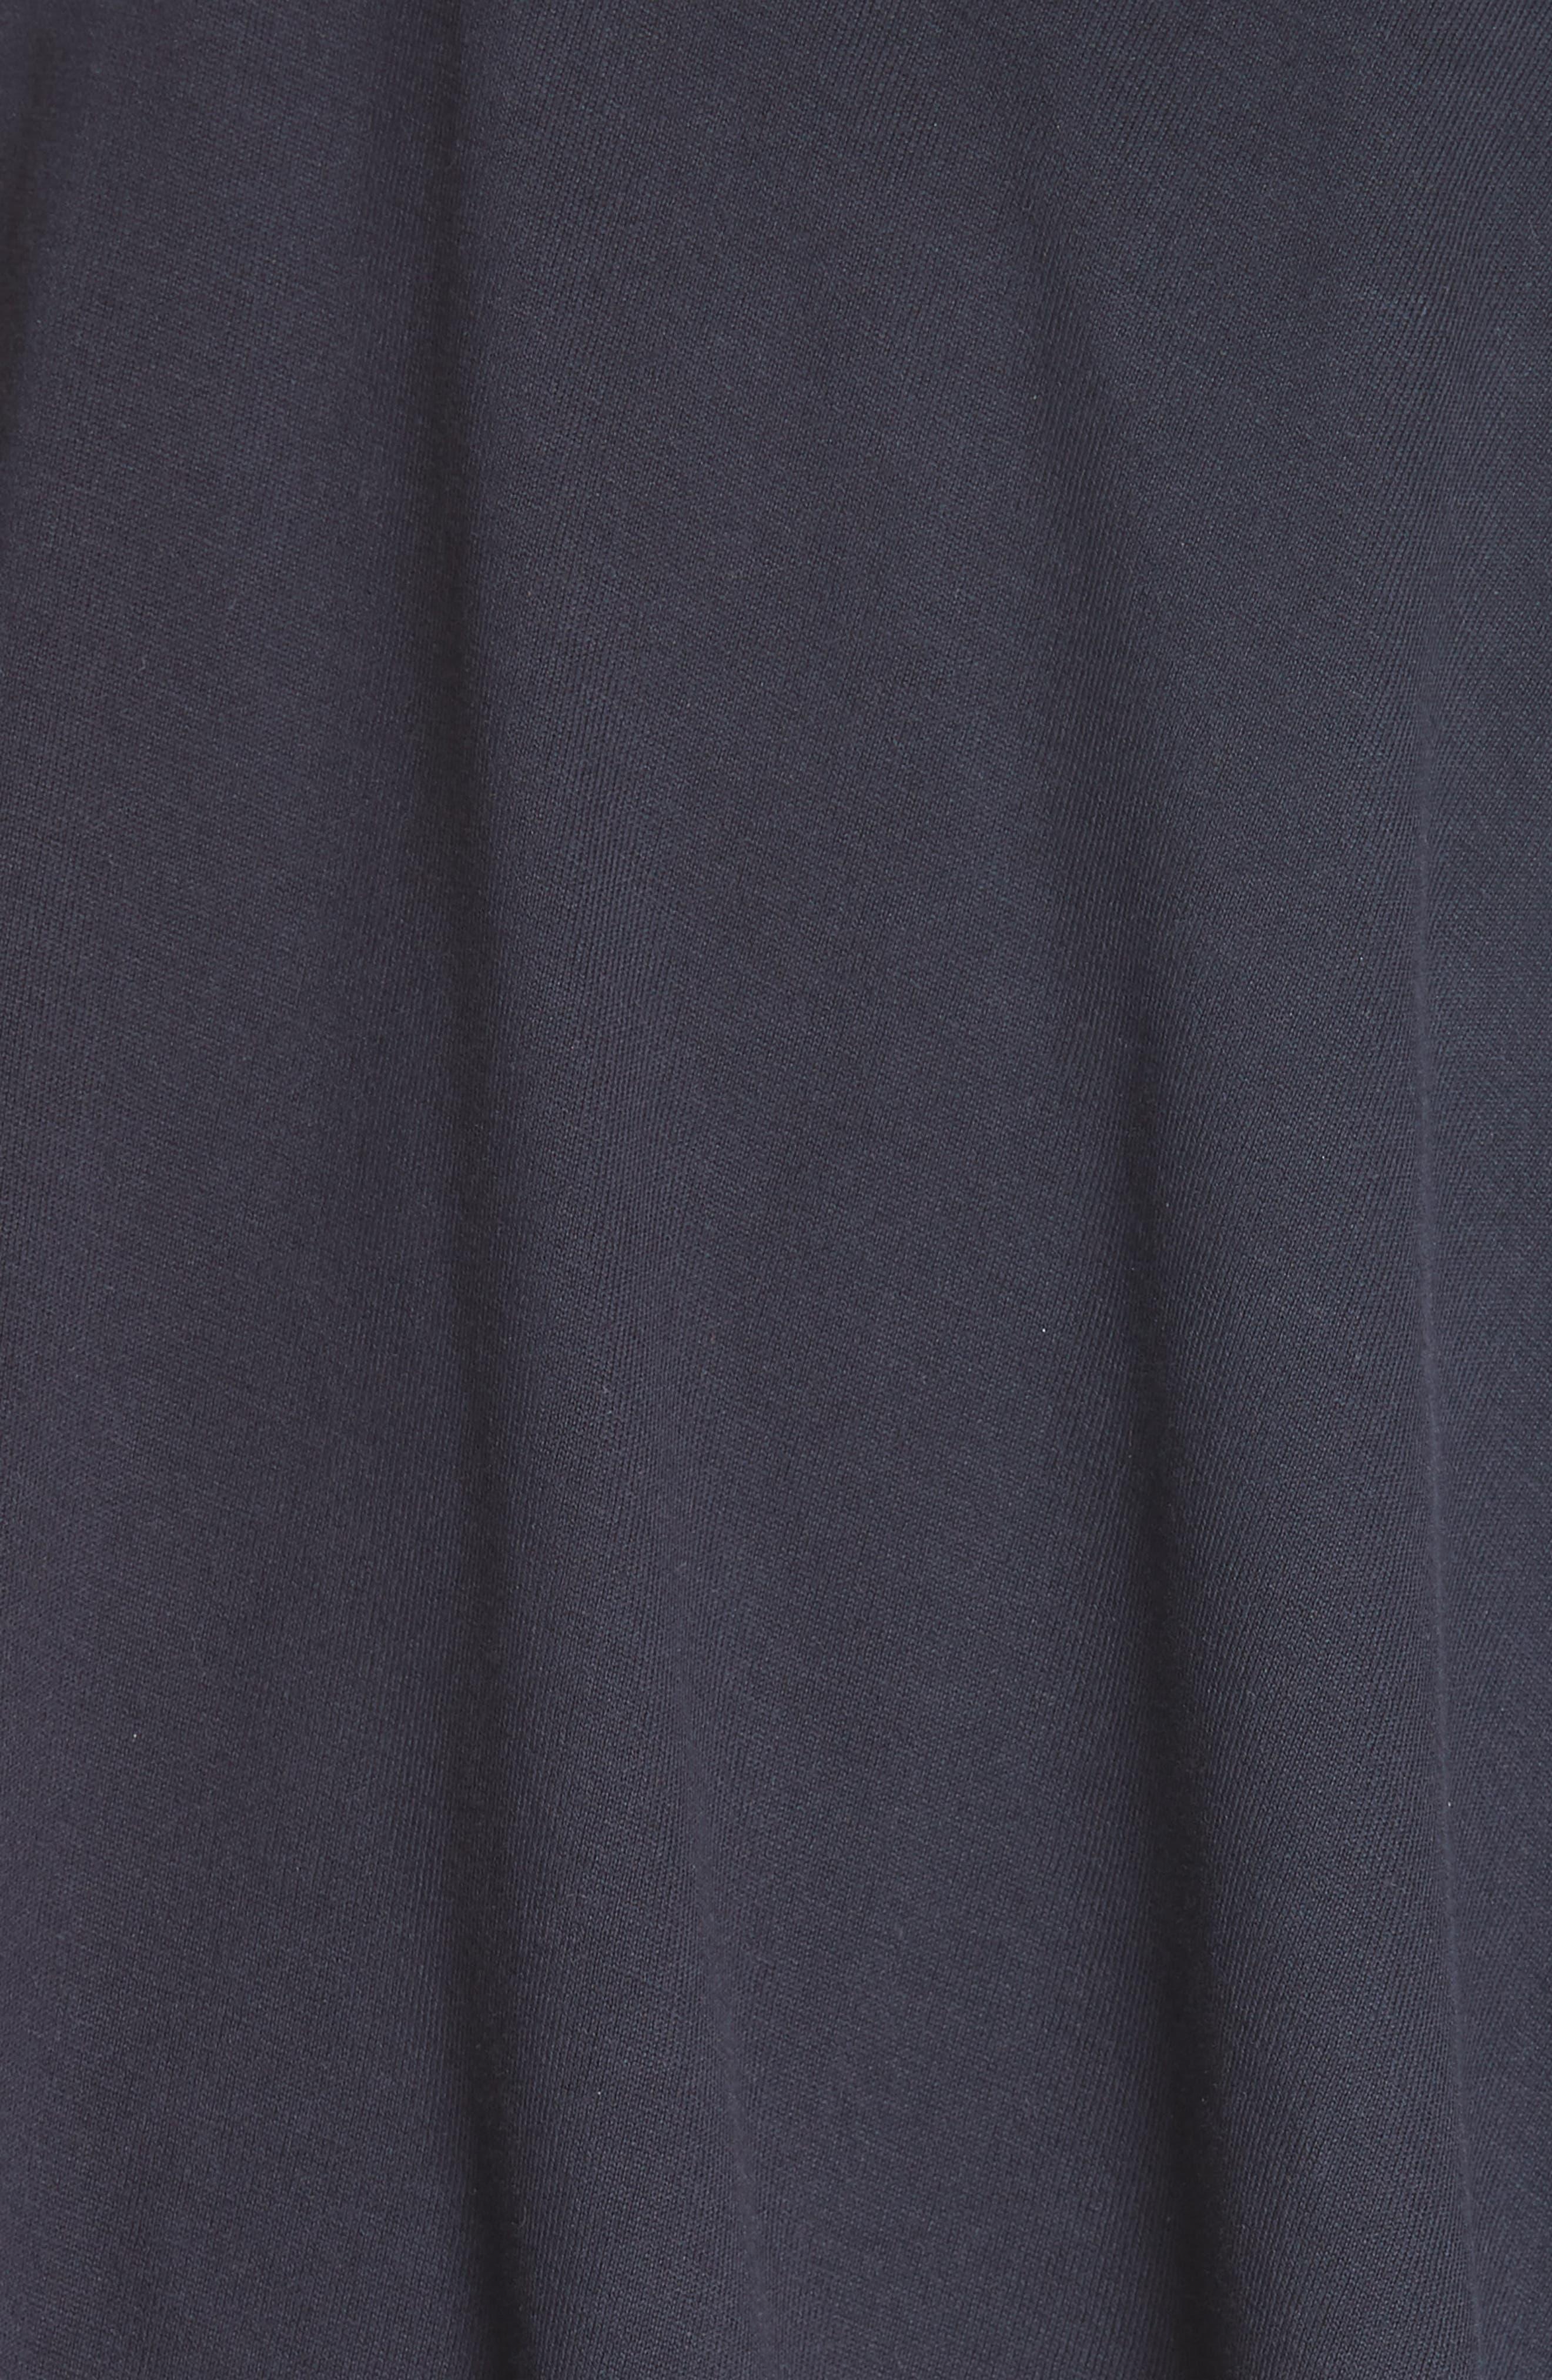 Doubled Short Sleeve Tee,                             Alternate thumbnail 6, color,                             GRCHINE/ NAVY